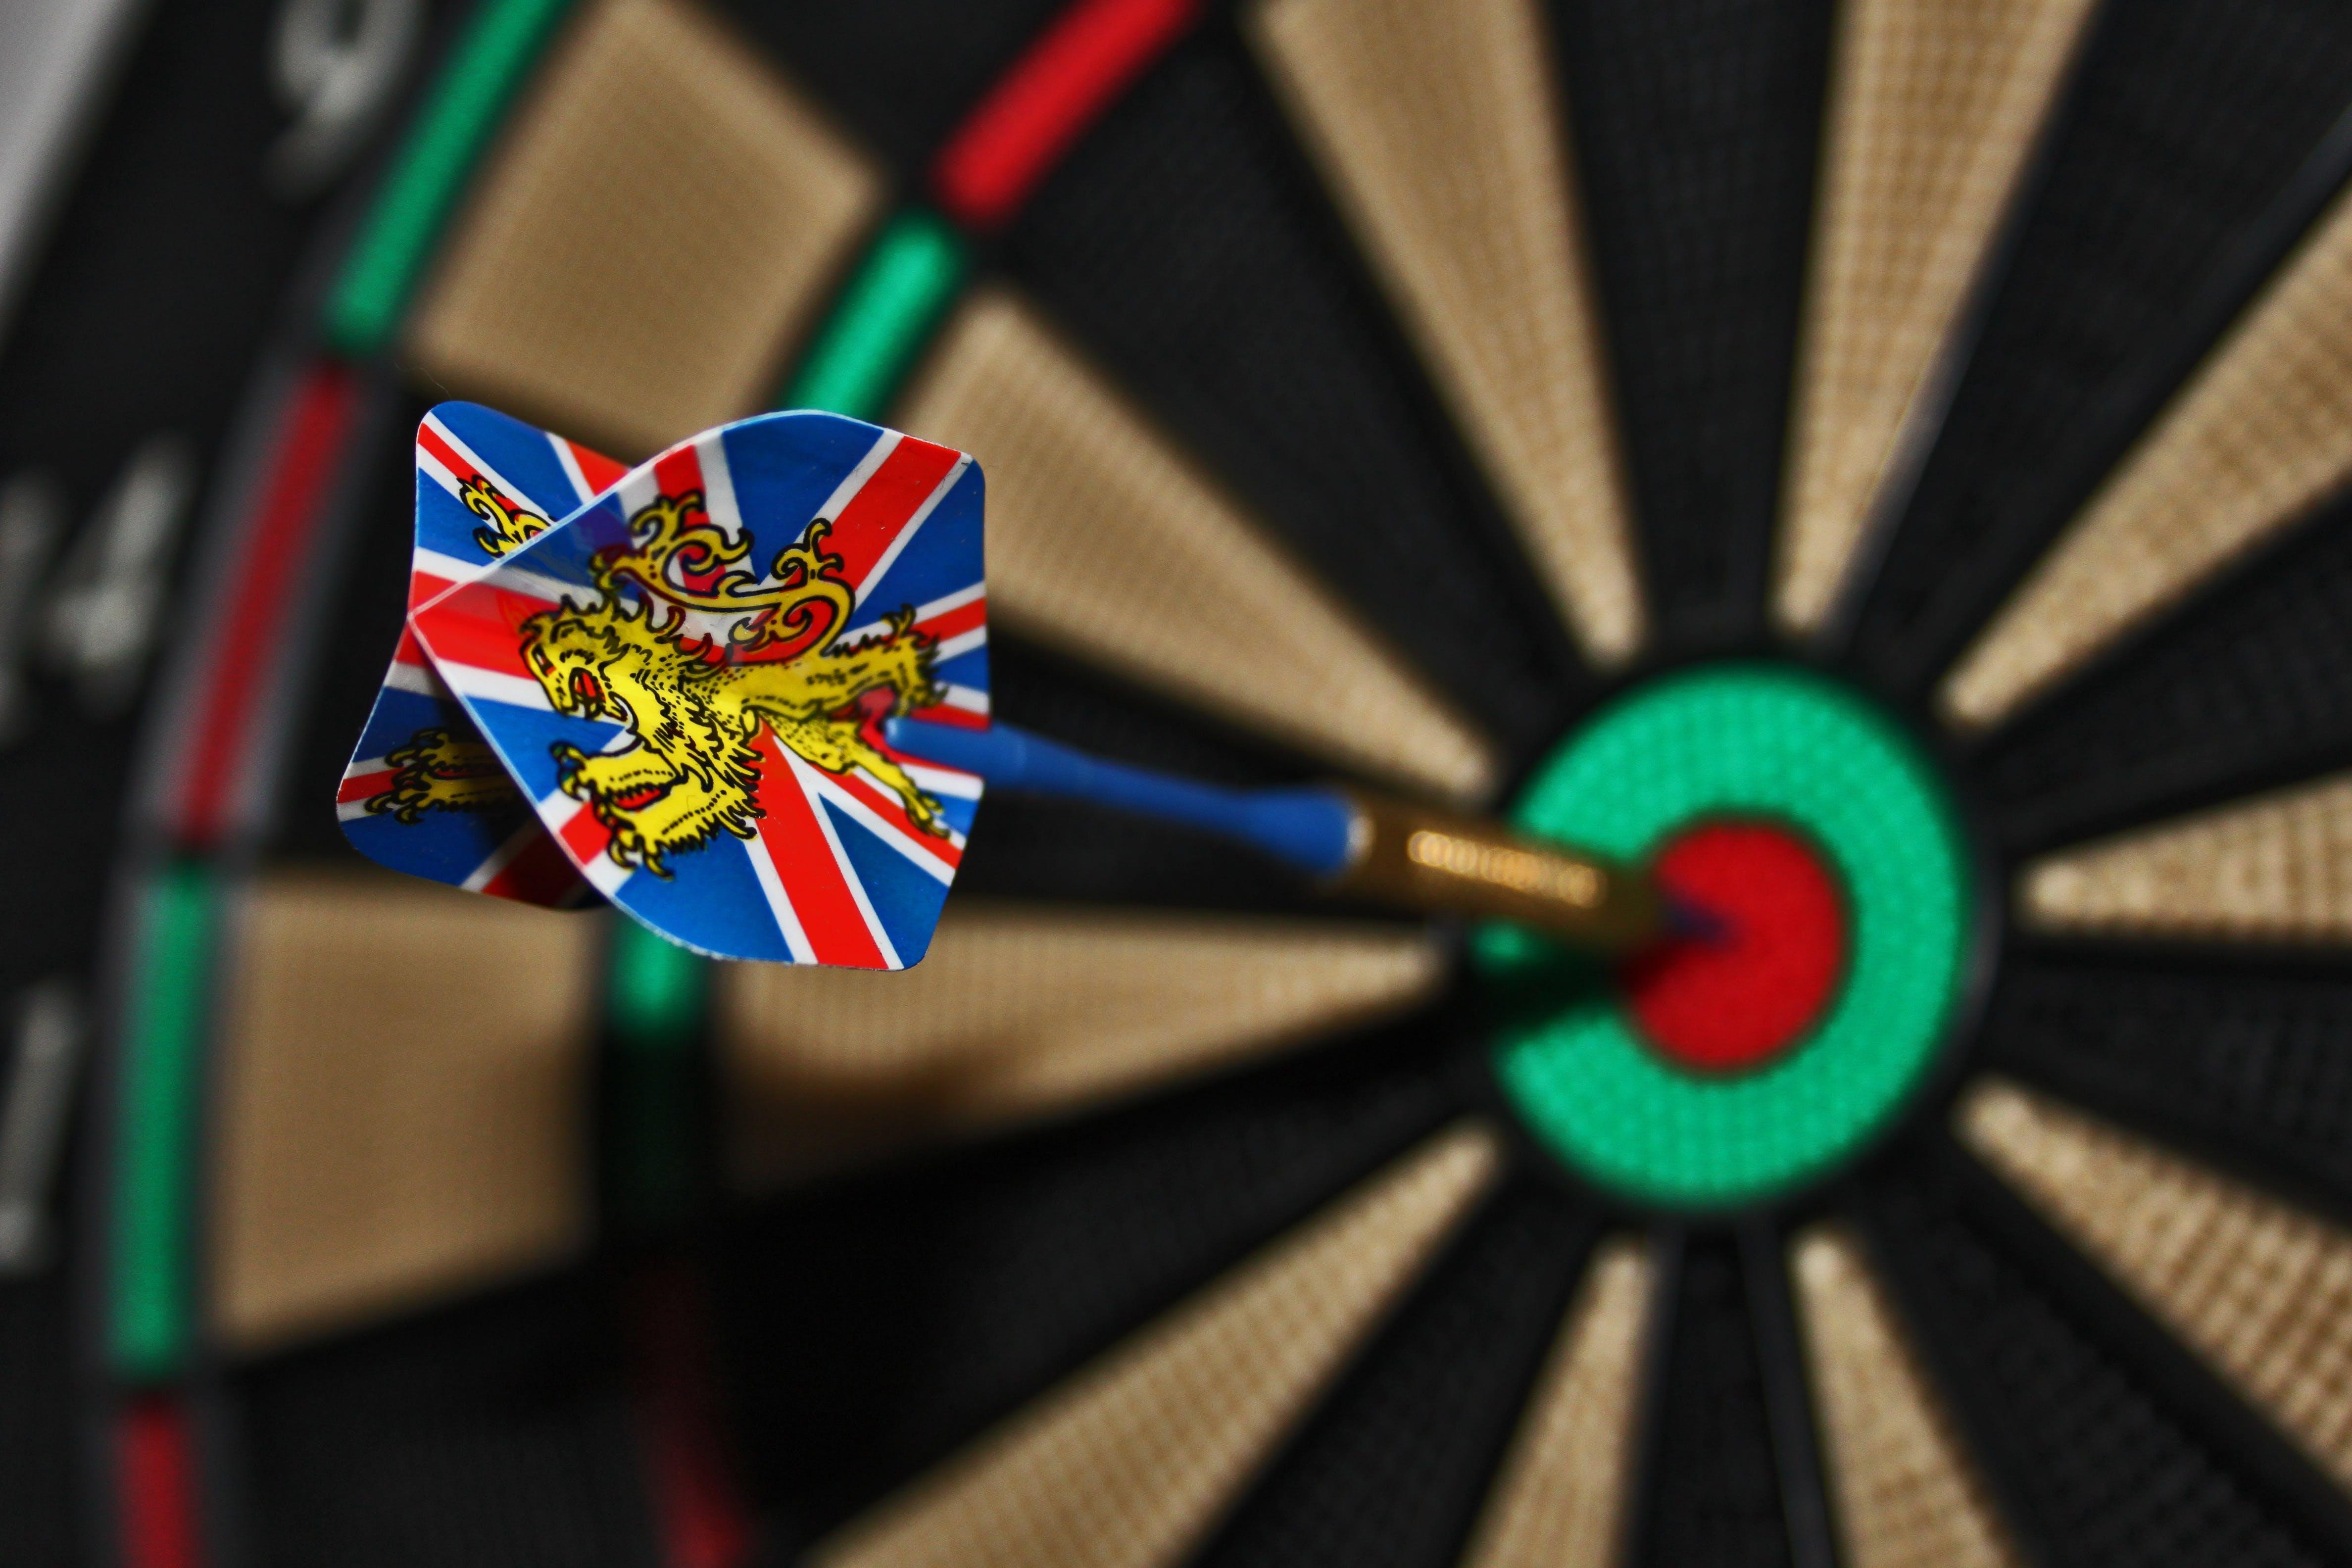 Blue Brown Dart on Red Green Black Dartboard